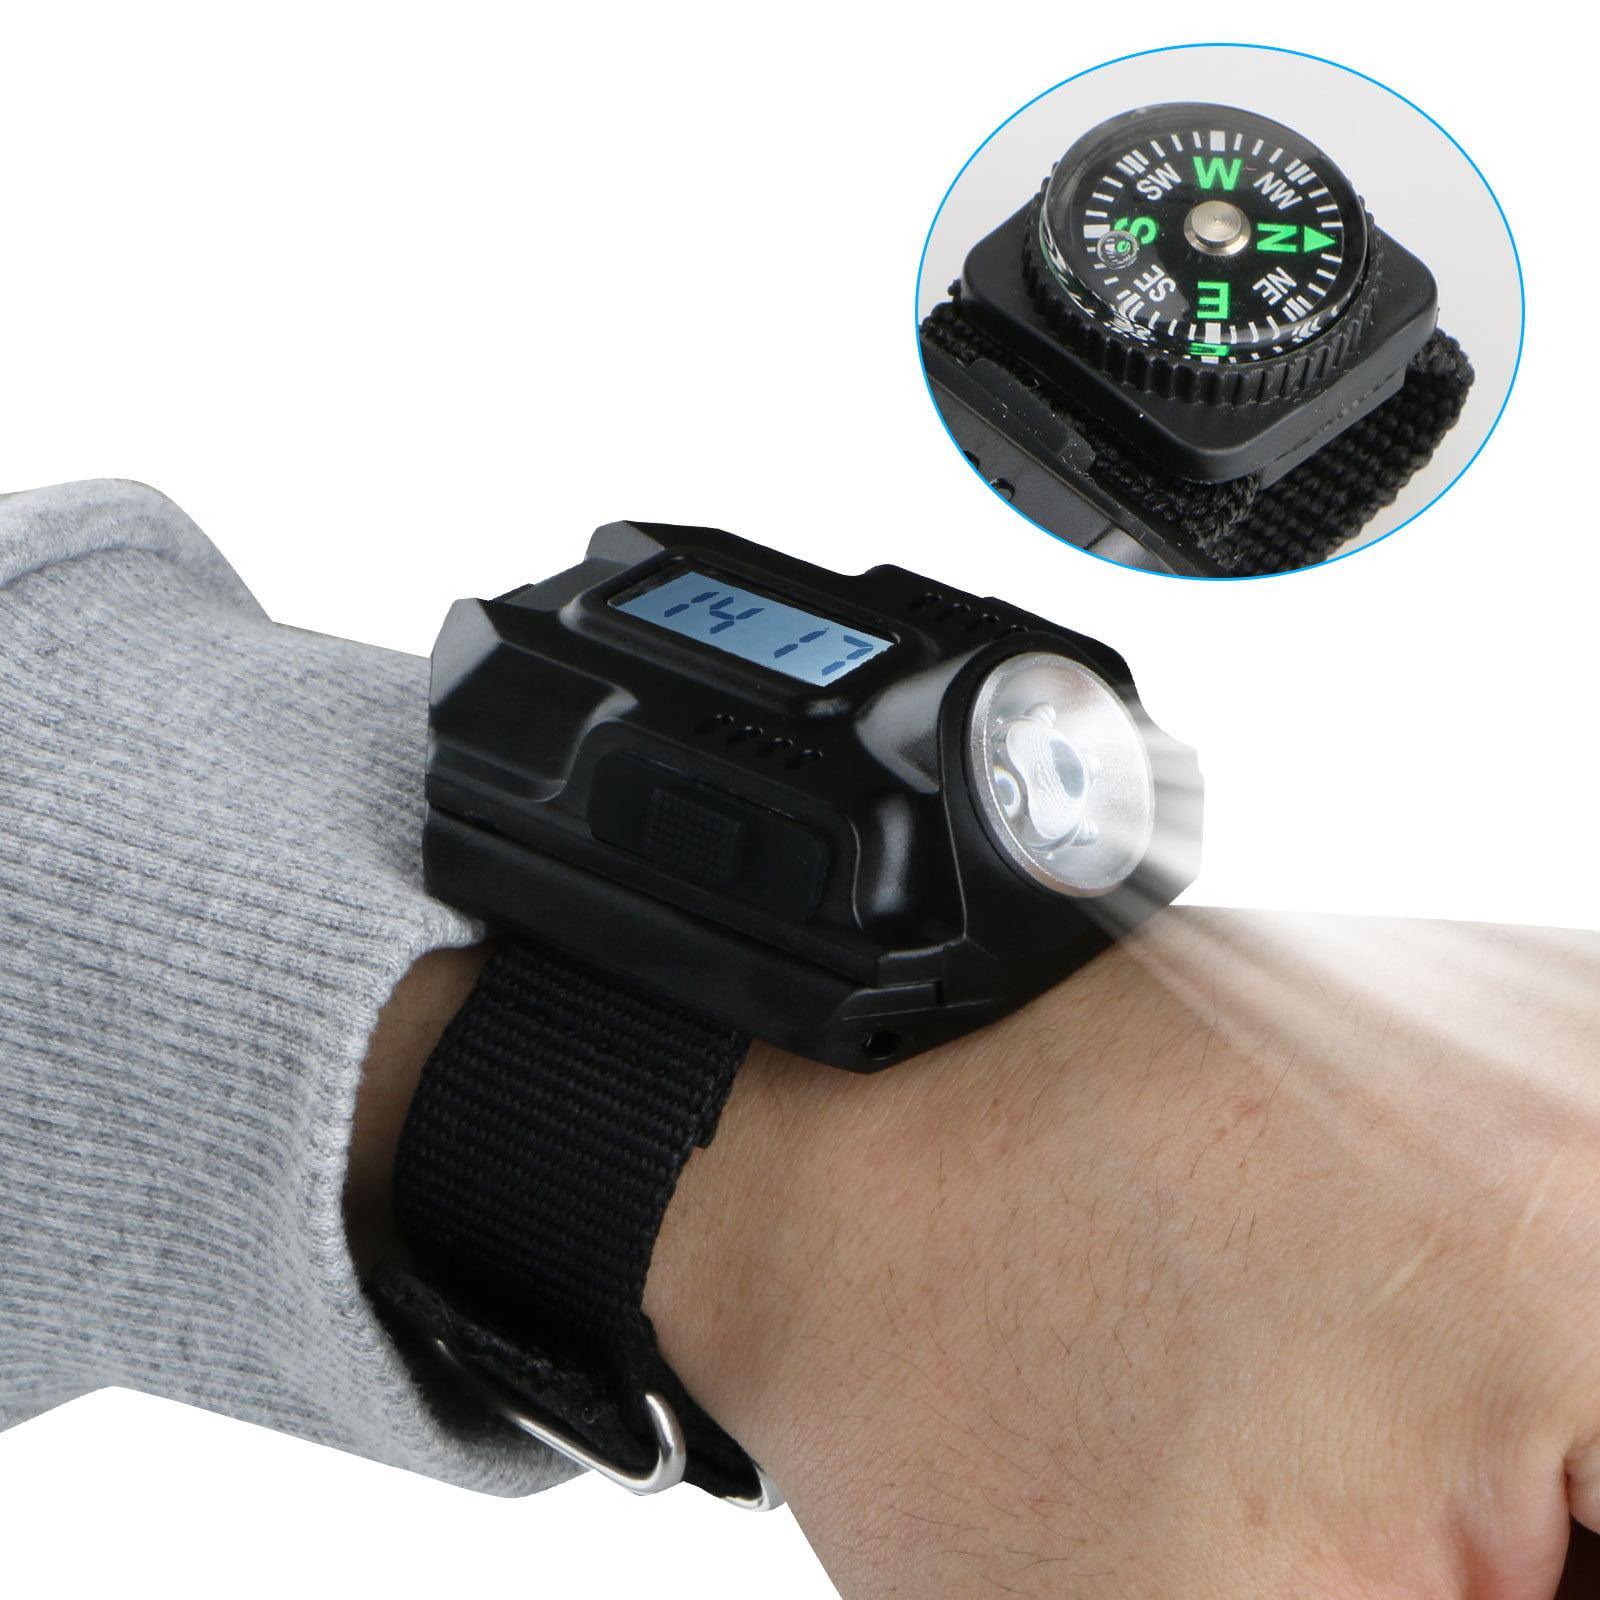 Wrist Watch with Flashlight, EEEKit Tactical Rechargeable 200 Lumens LED Torch Wrist Light IPX7 Waterproof Wrist Light Quartz Watch Compass for Hiking, Riding, Running, Camping